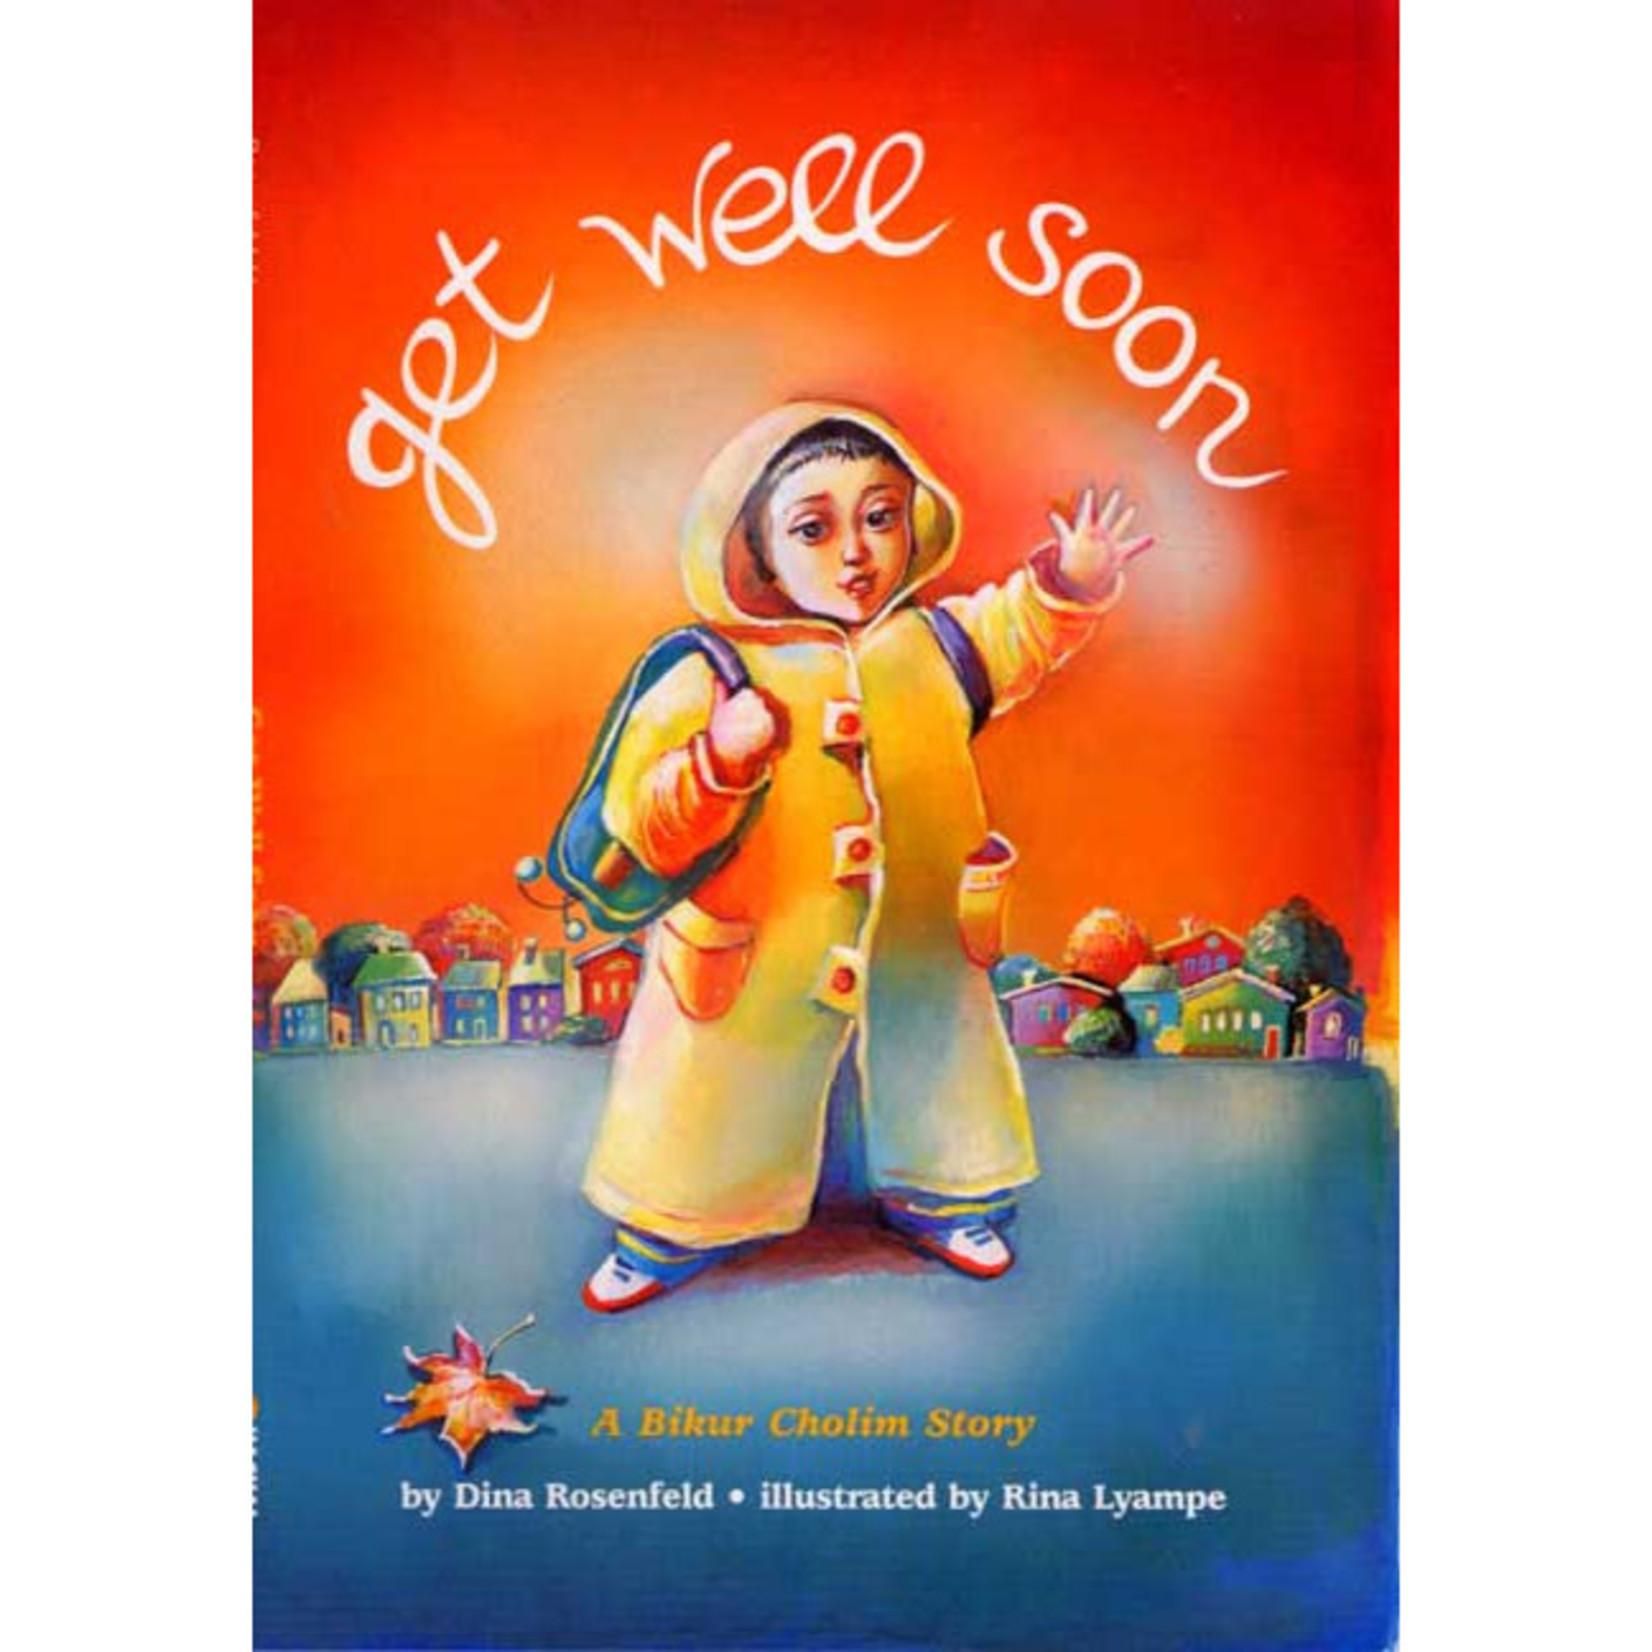 Get Well Soon - A Bikur Cholim Story